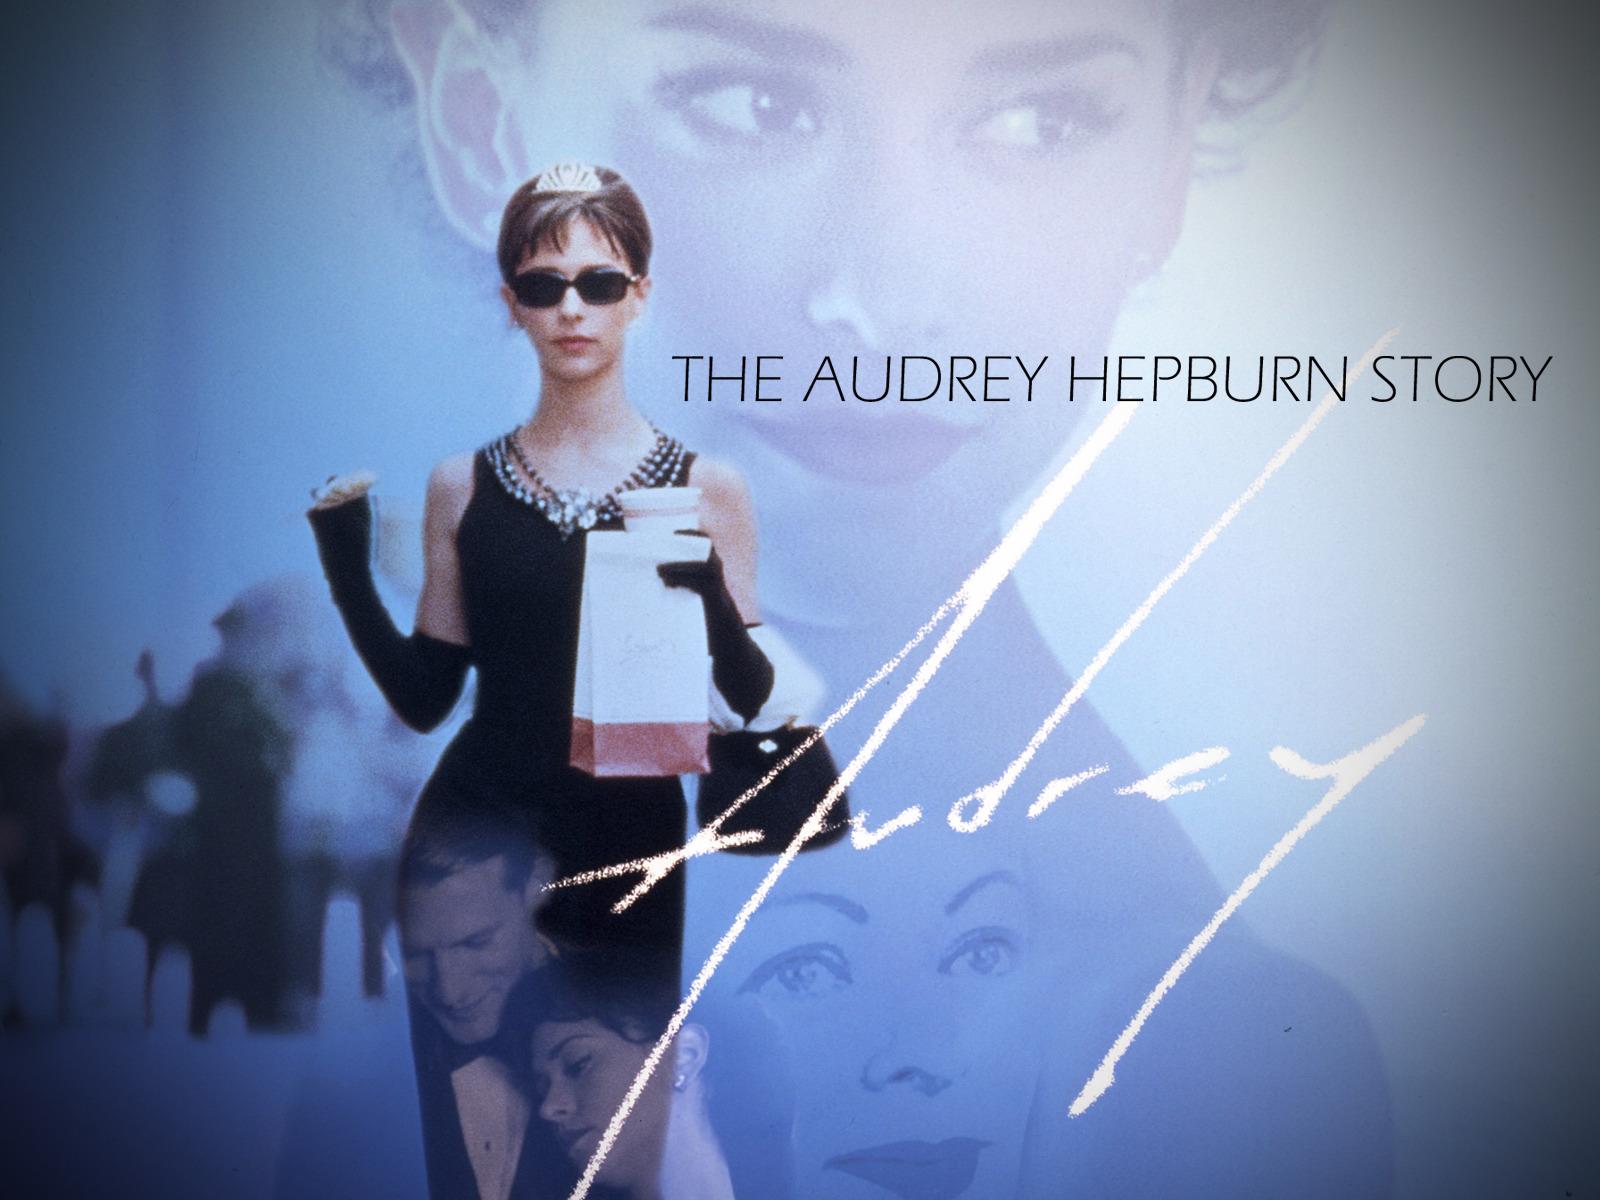 Prime Video: The Audrey Hepburn Story